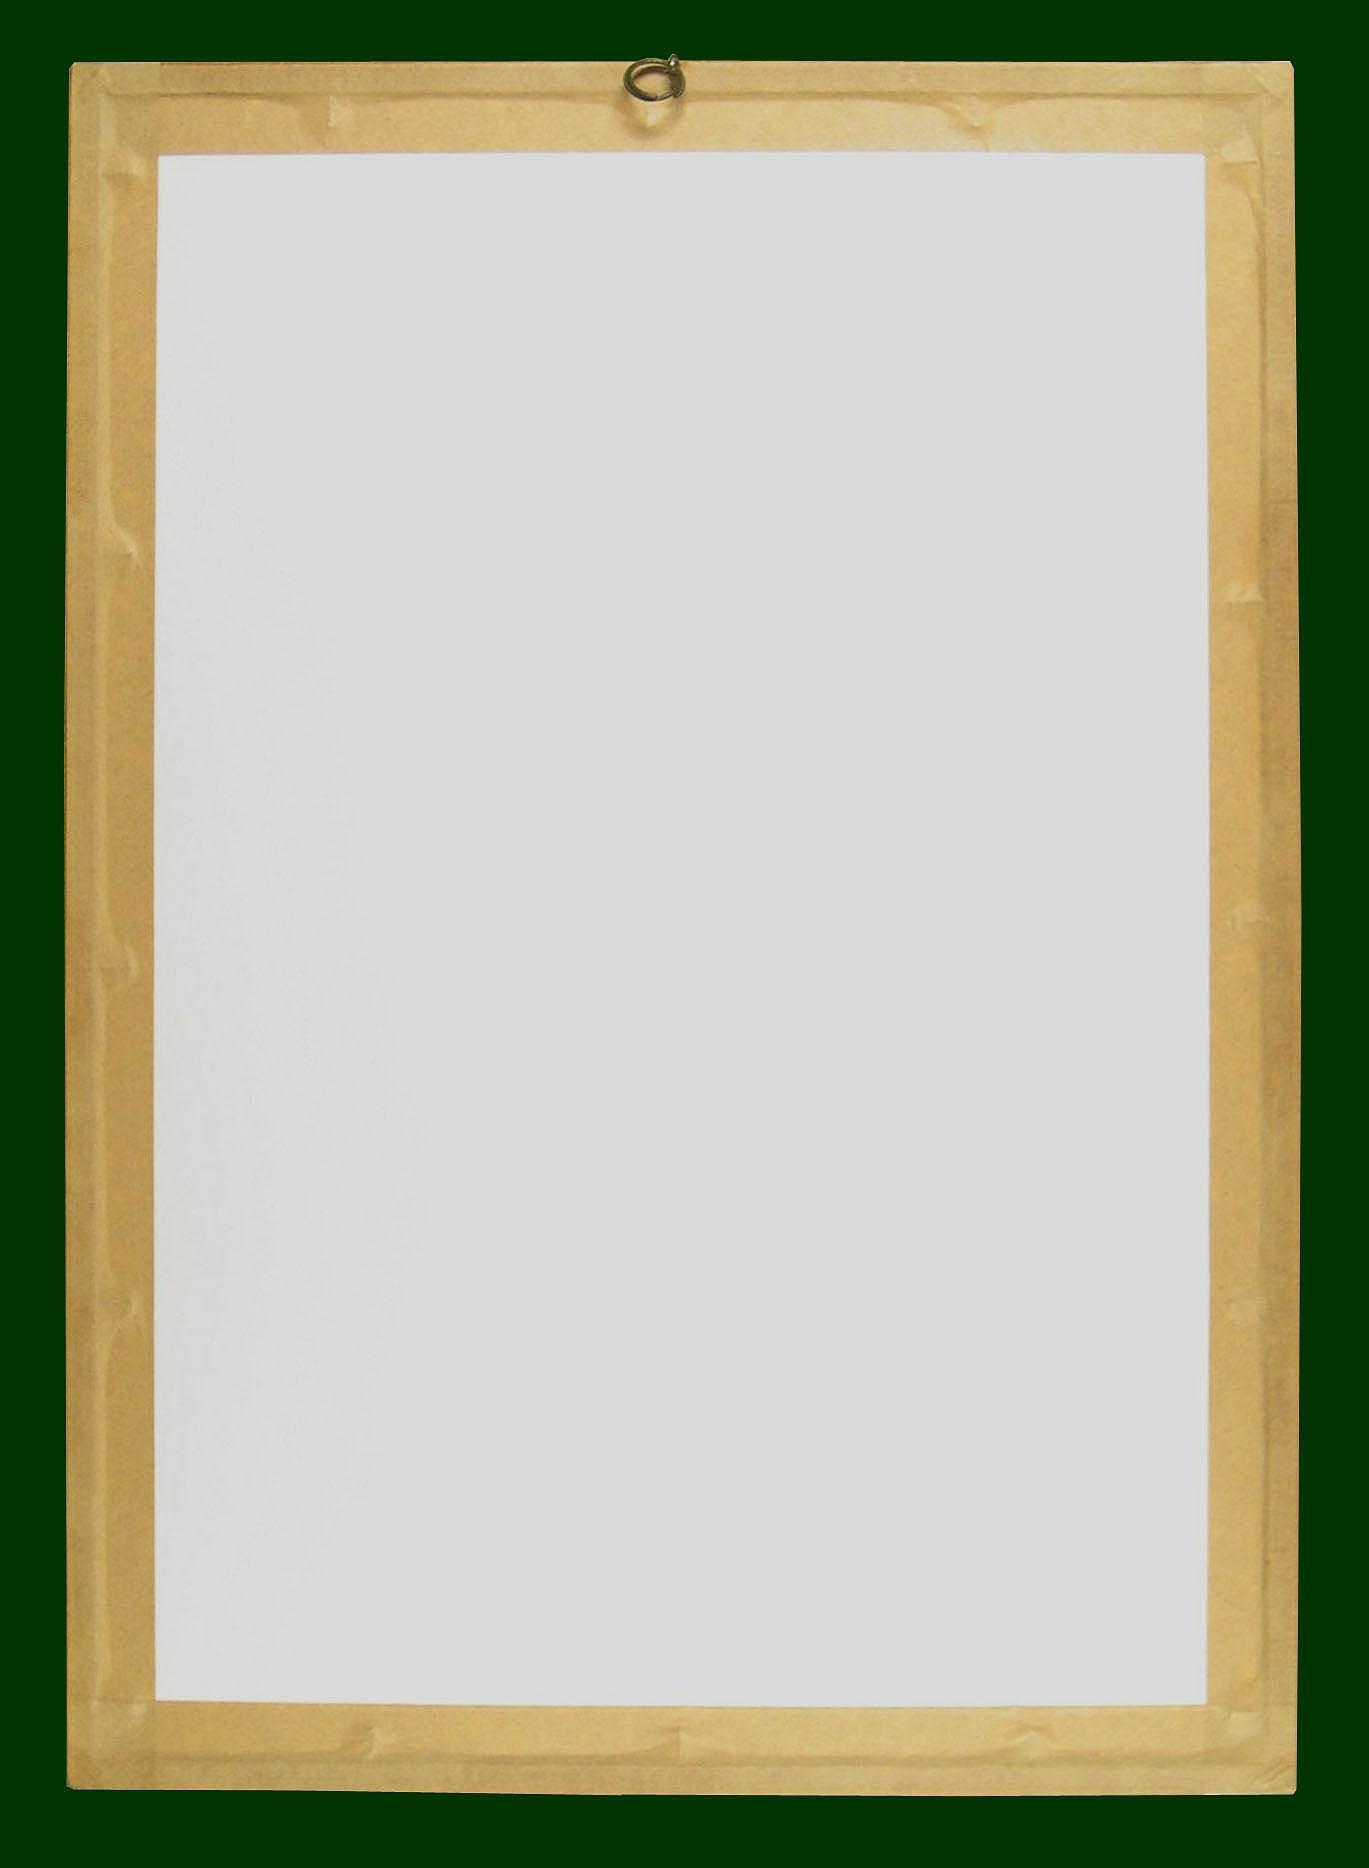 40-4h_t.jpg (1369�1868)